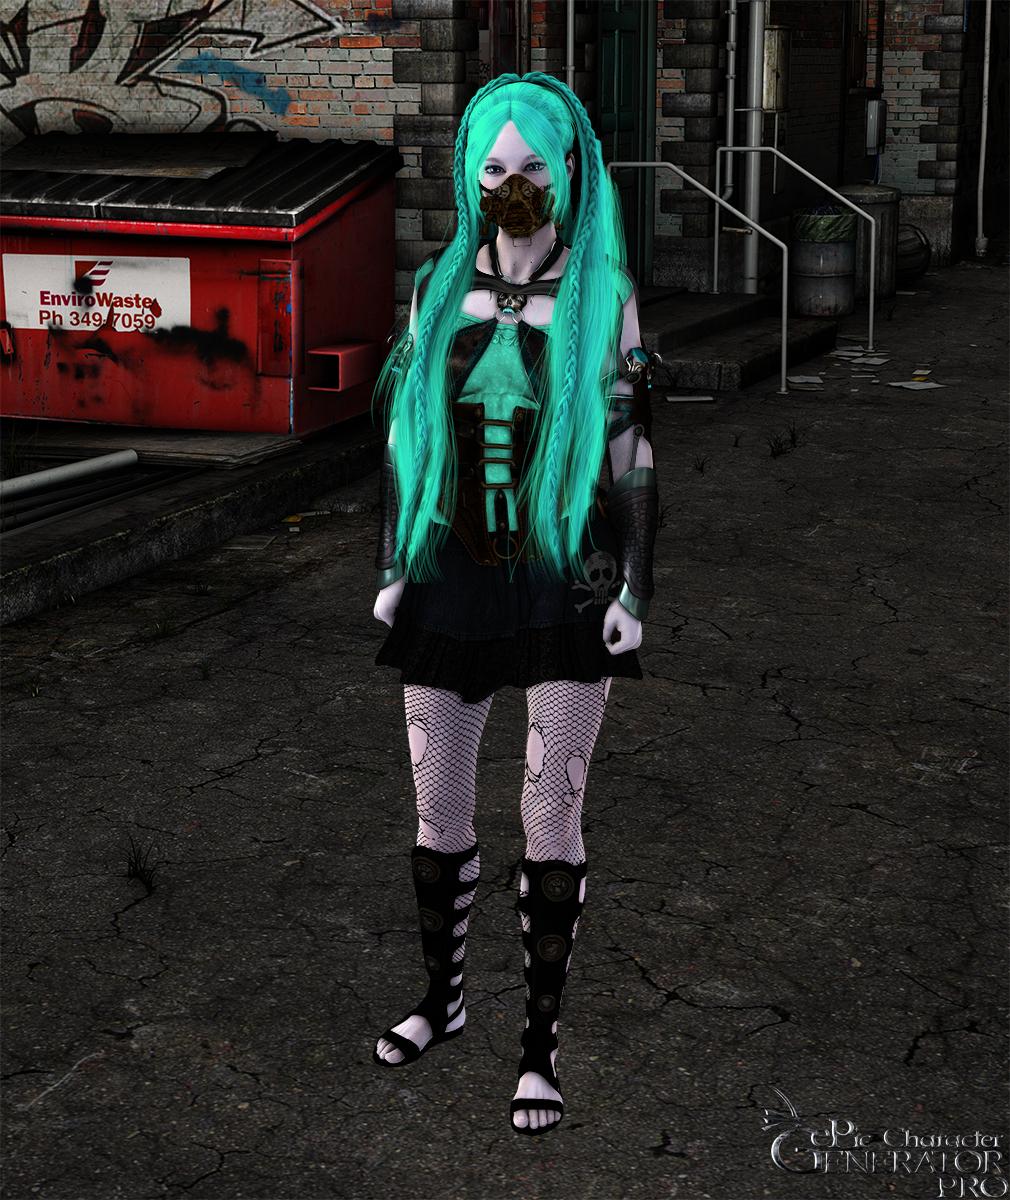 Cybergoth.png